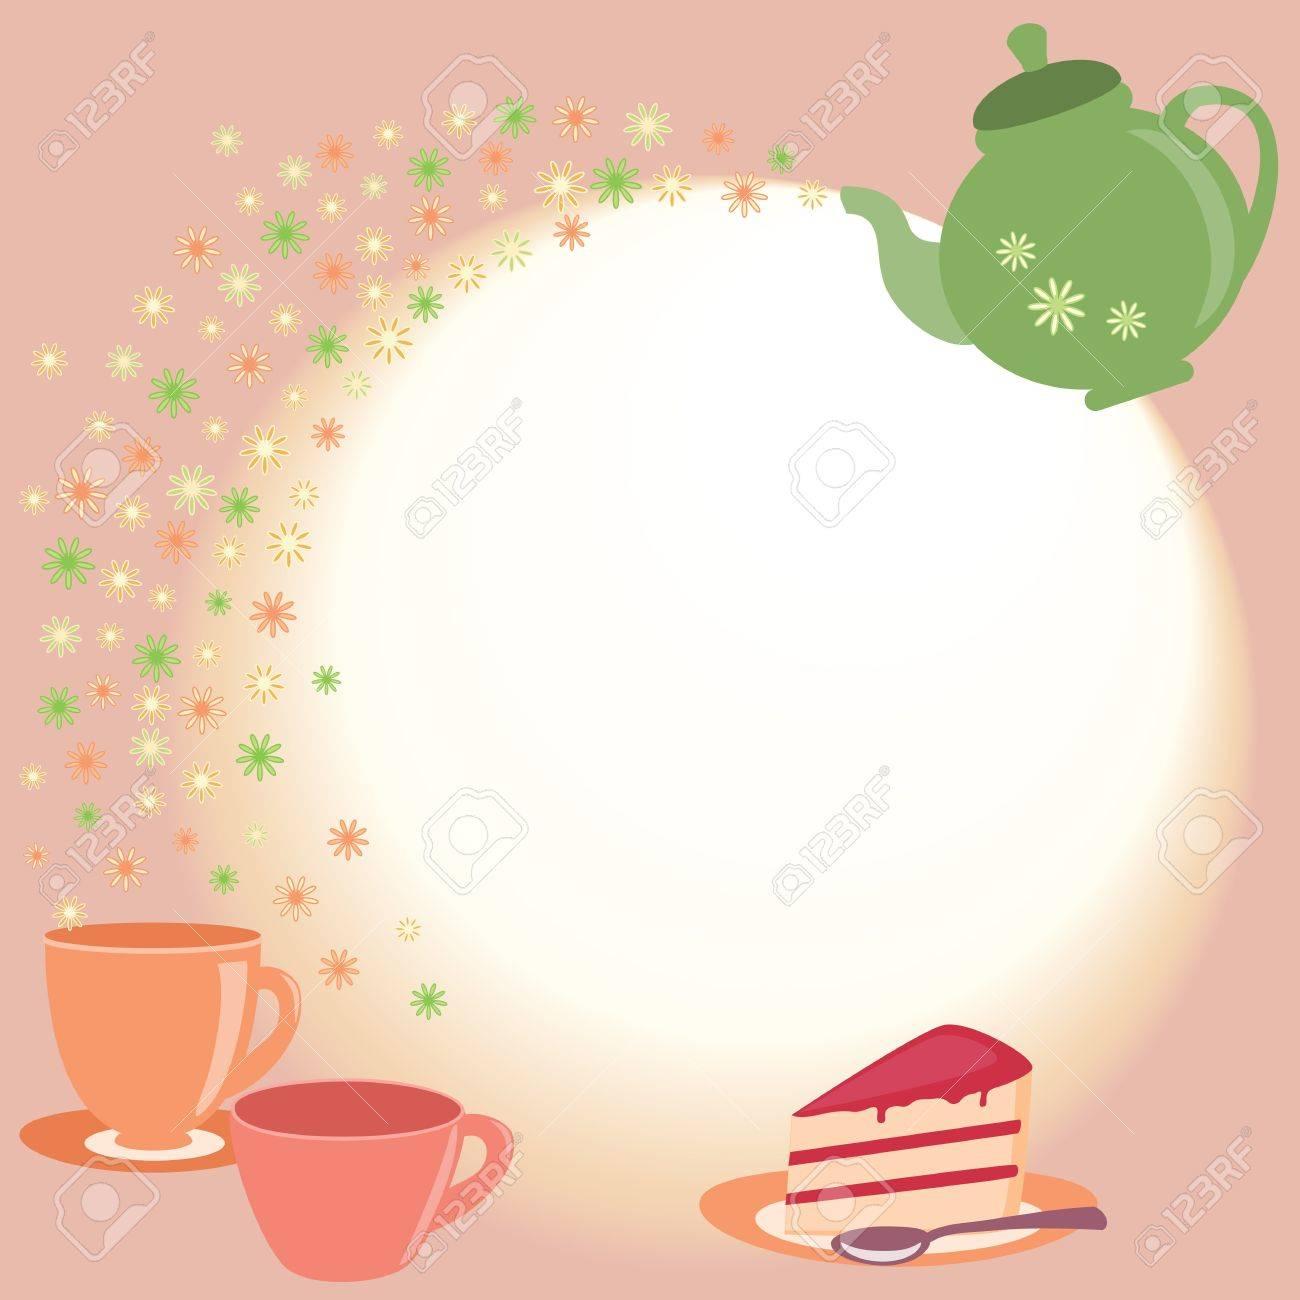 Elegant tea party invitation template with teacups cartoon vector - Tea Time Teacups Bright Tea Card With Teapot Cups And Flowers Illustration